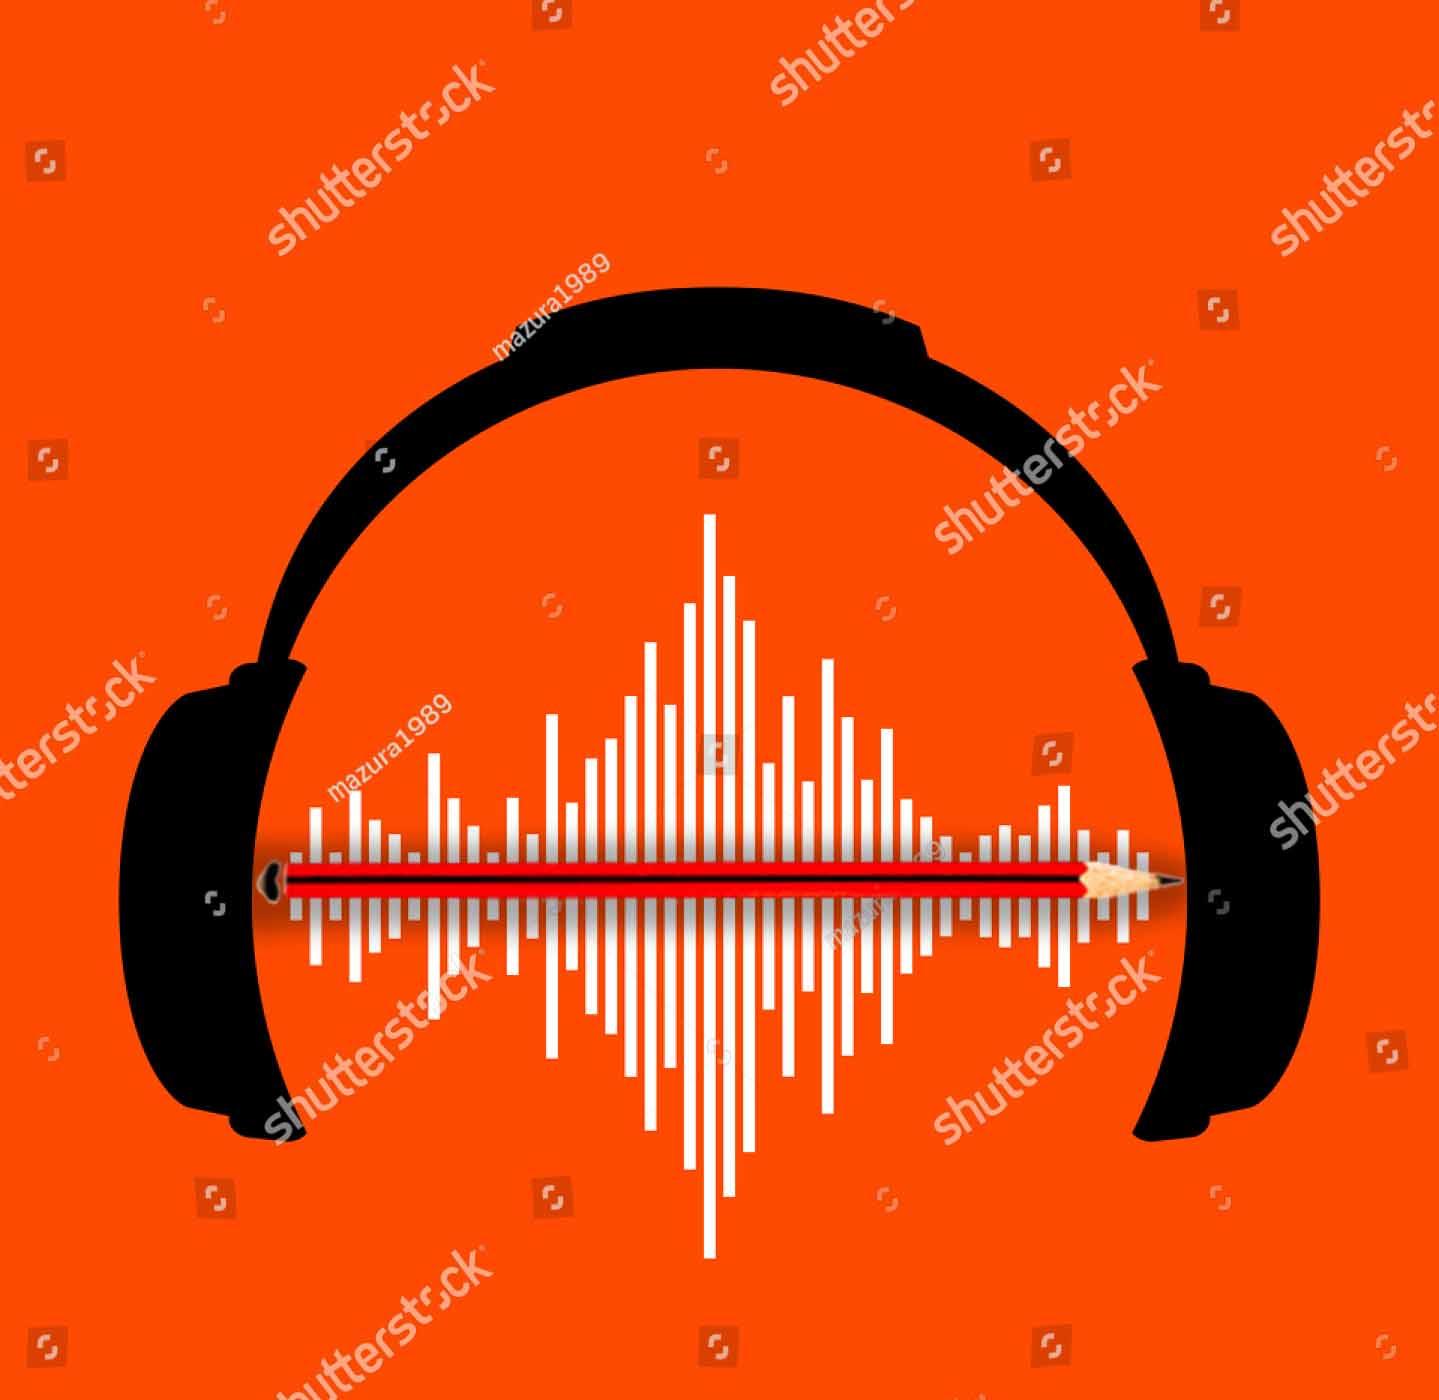 Copywriting & Music